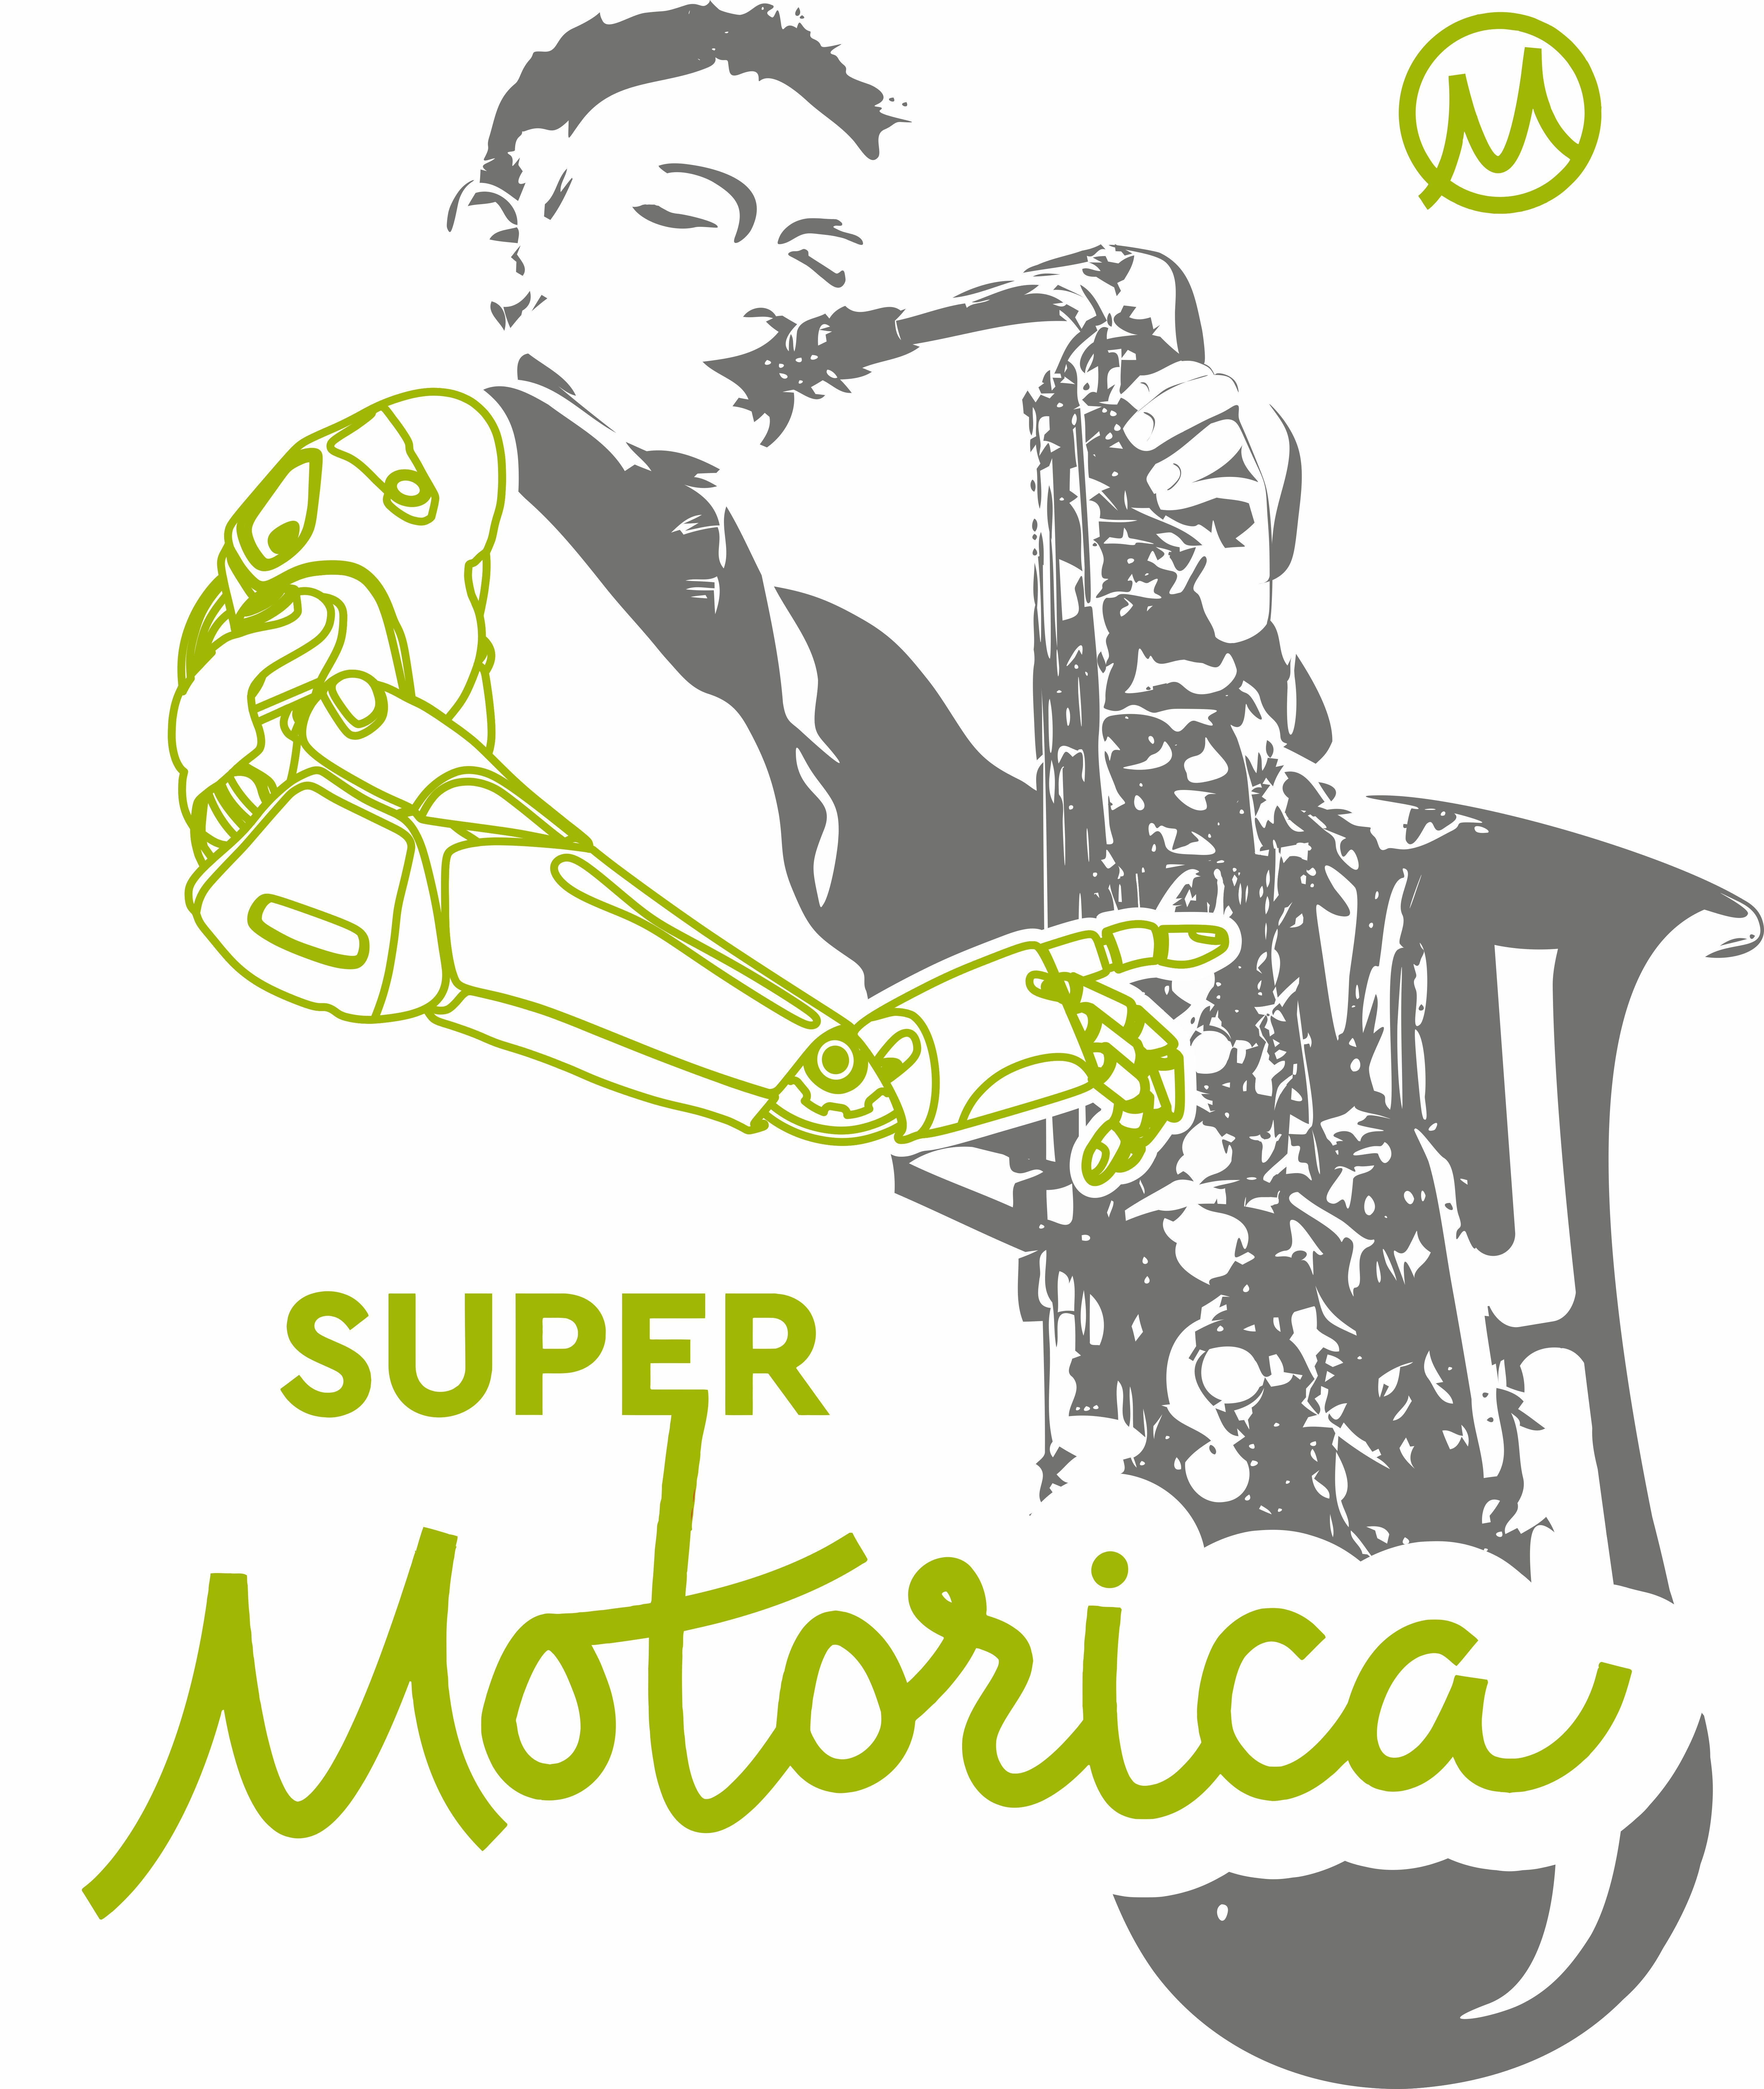 Нарисовать принты на футболки для компании Моторика фото f_16060a583ae7f2ad.jpg